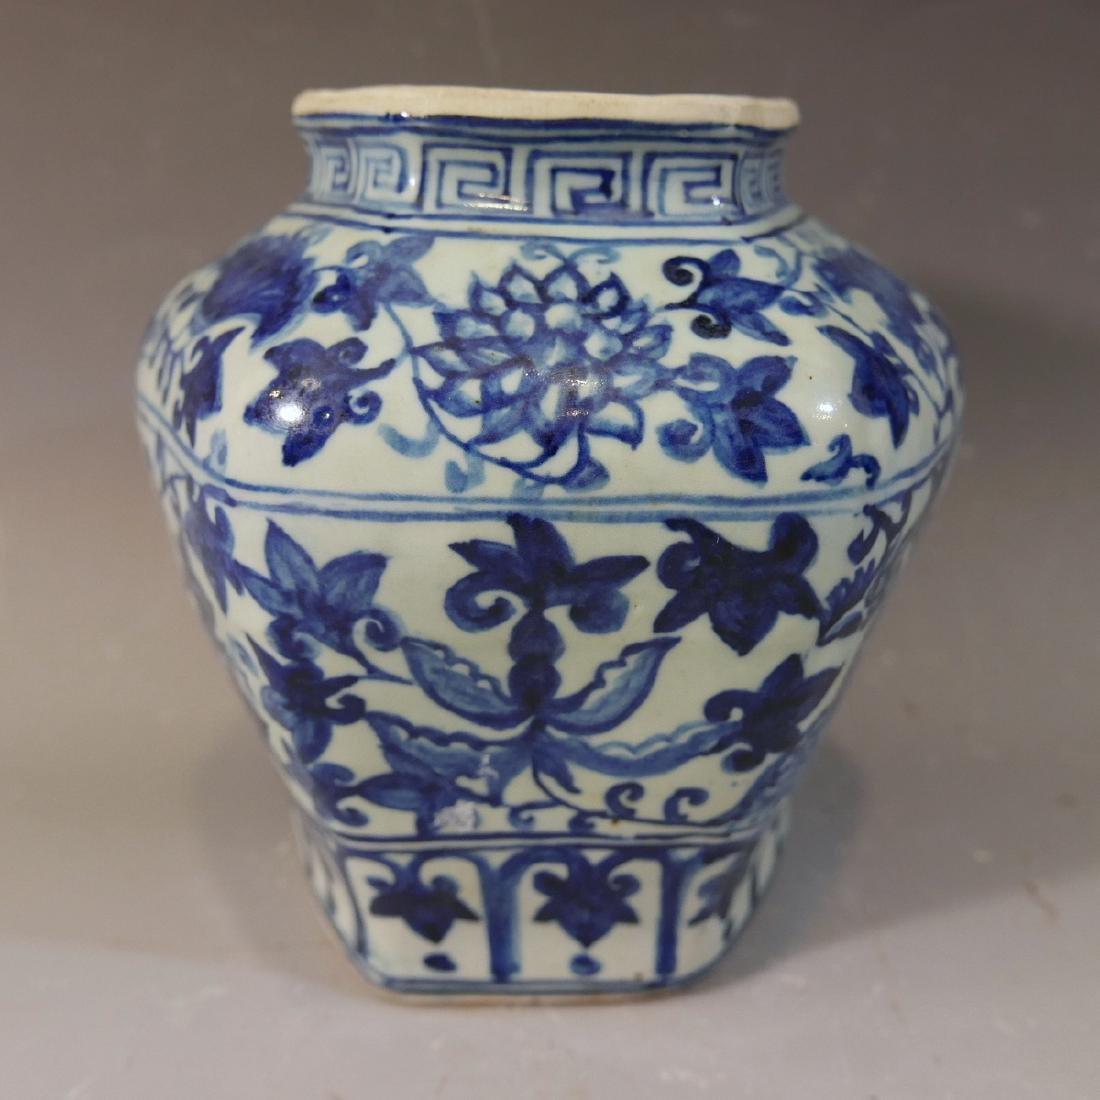 ANTIQUE CHIENSE BLUE WHITE PORCELAIN JAR - MING DYNASTY